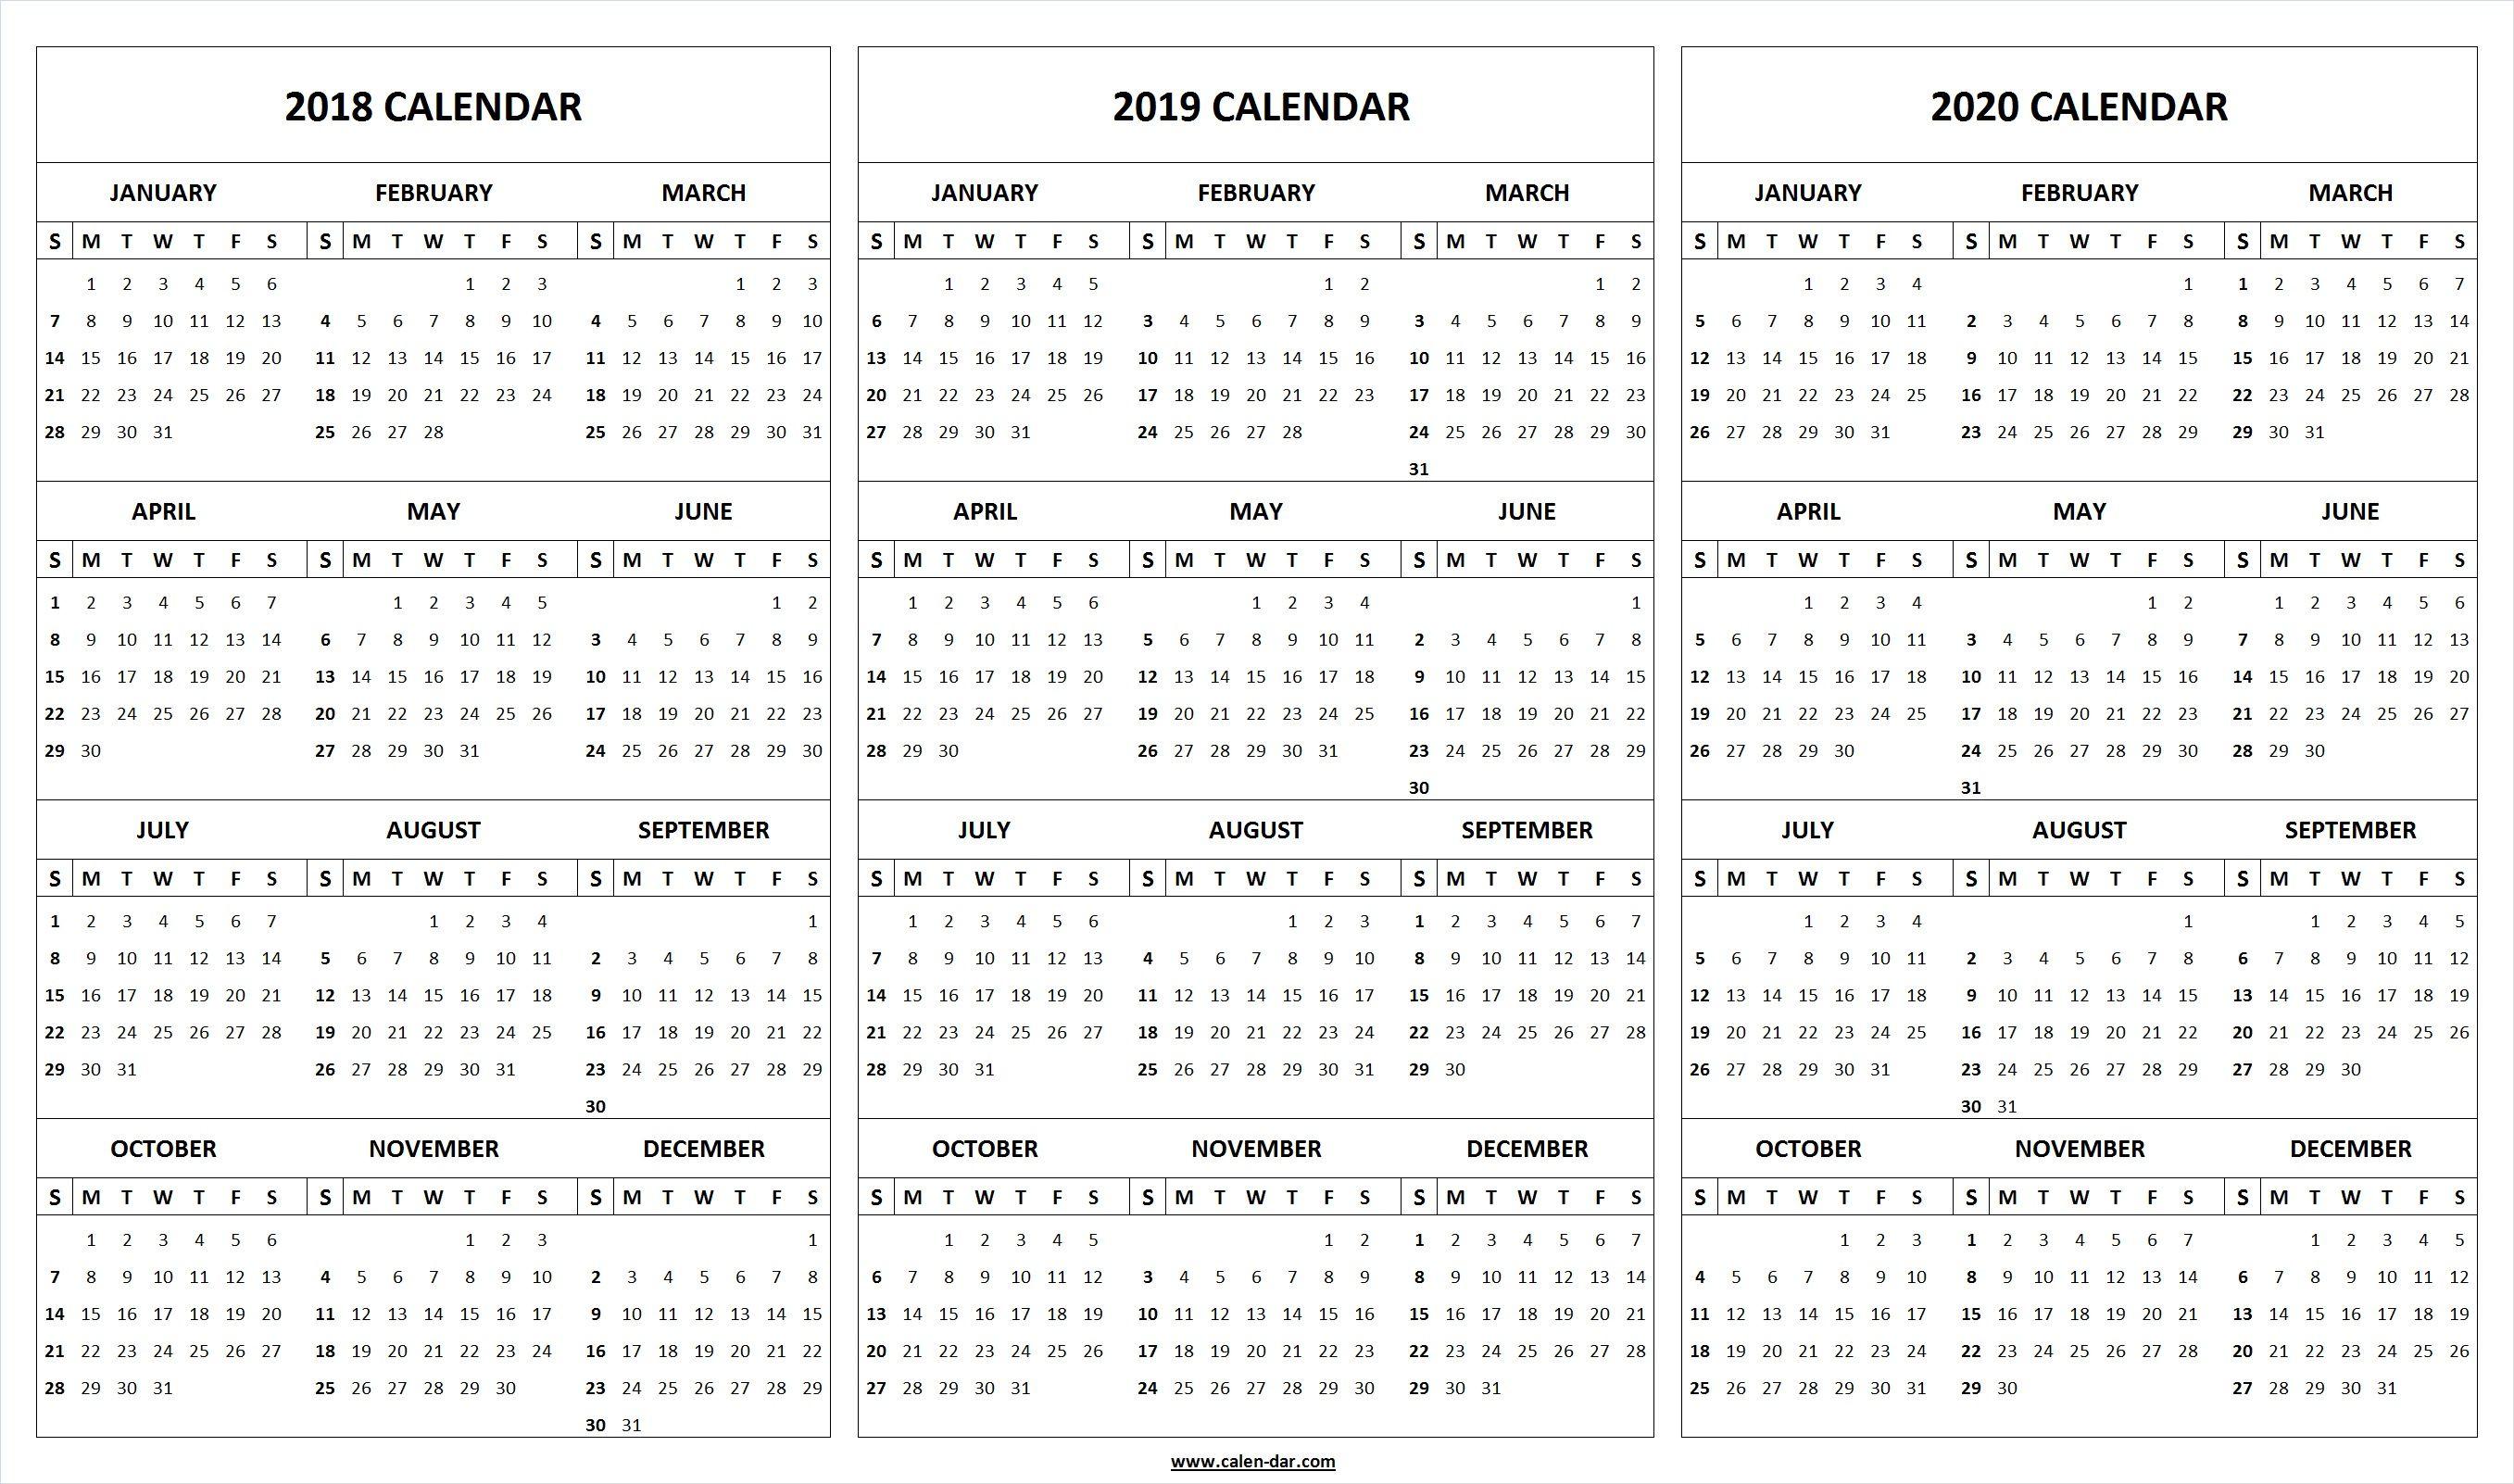 Print Blank 2018 2019 2020 Calendar Template | Organize! | 2019 intended for Printable Year At A Glance Calendar 2019-2020